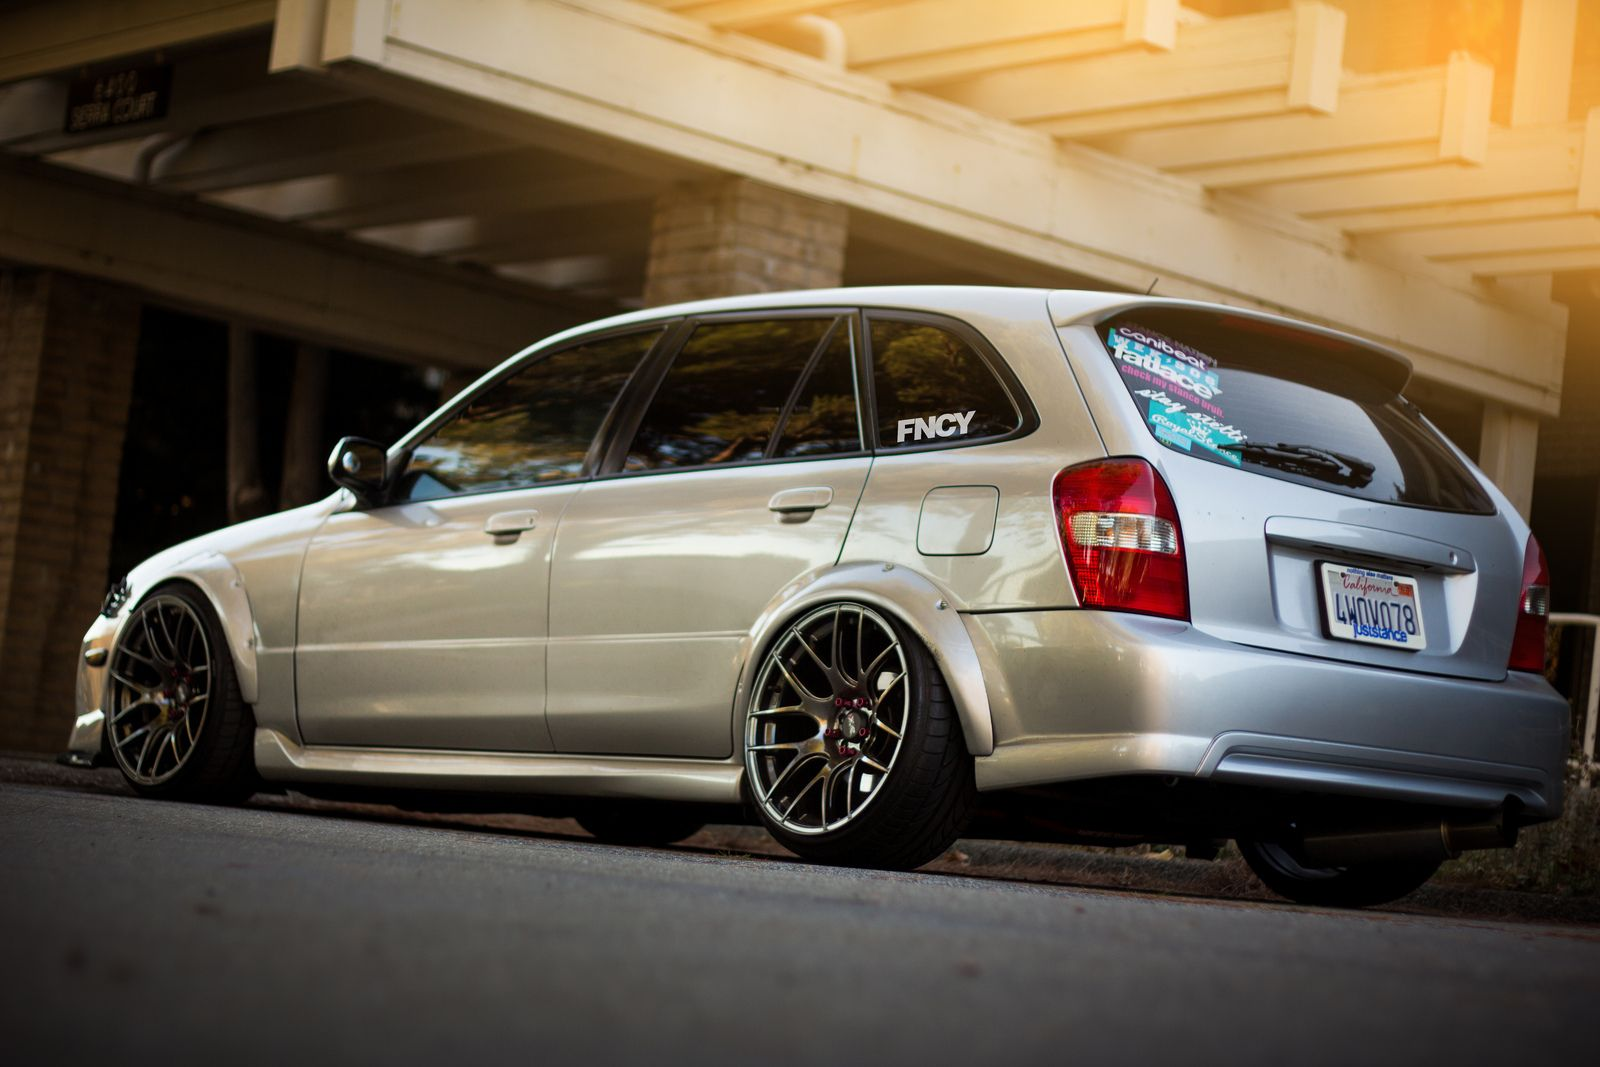 stanced+mazda | stanced mazda 323 | cars-wagons | pinterest